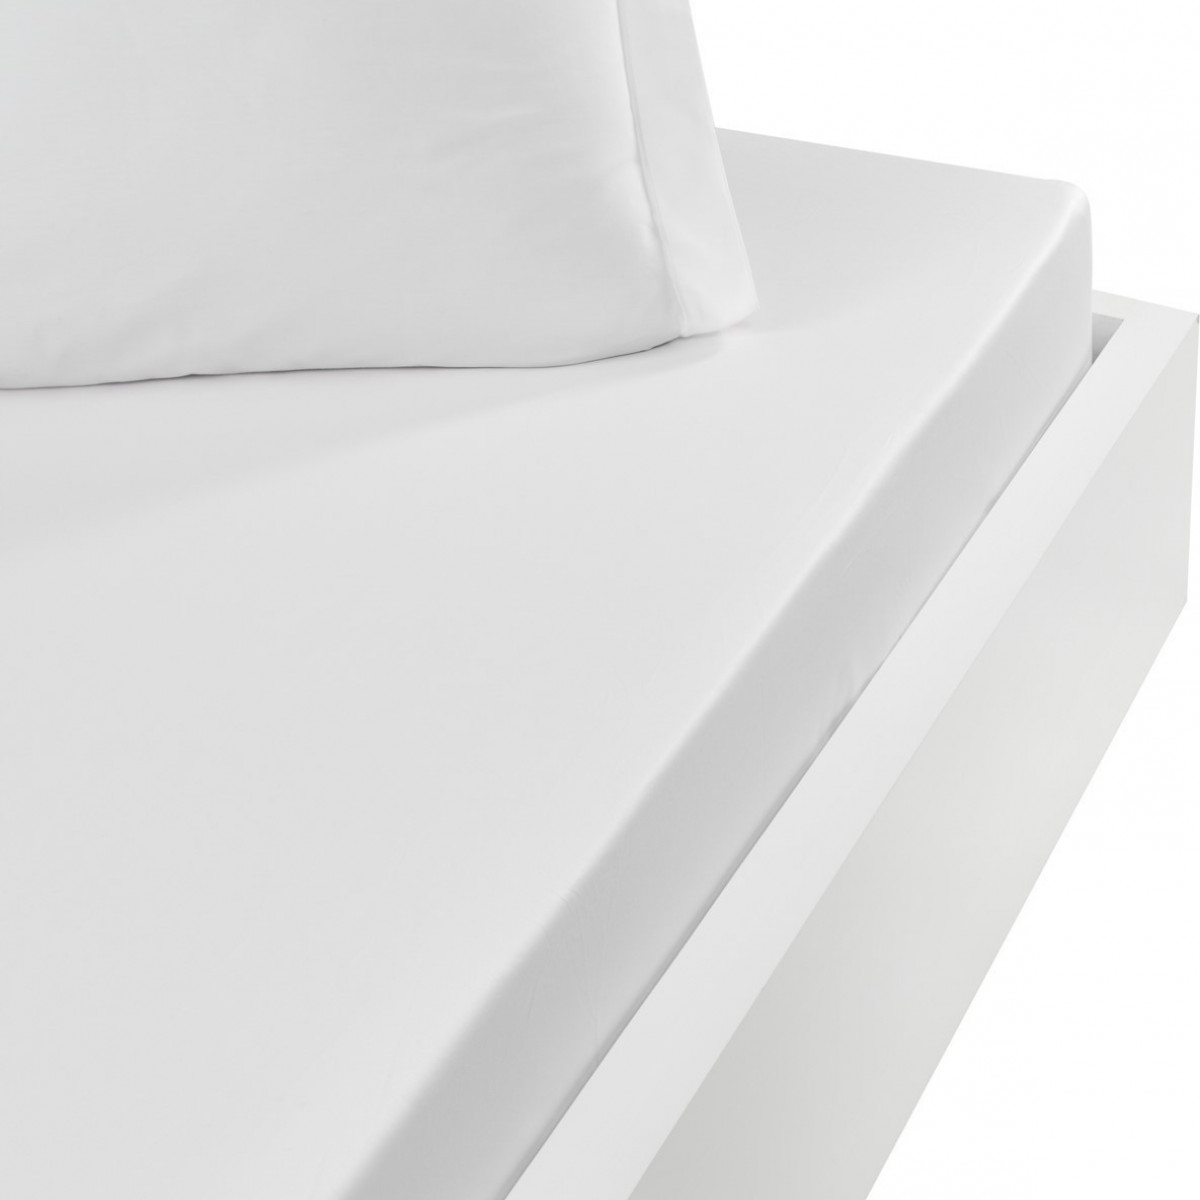 Drap housse en percale de coton bon Blanc 200x200 cm